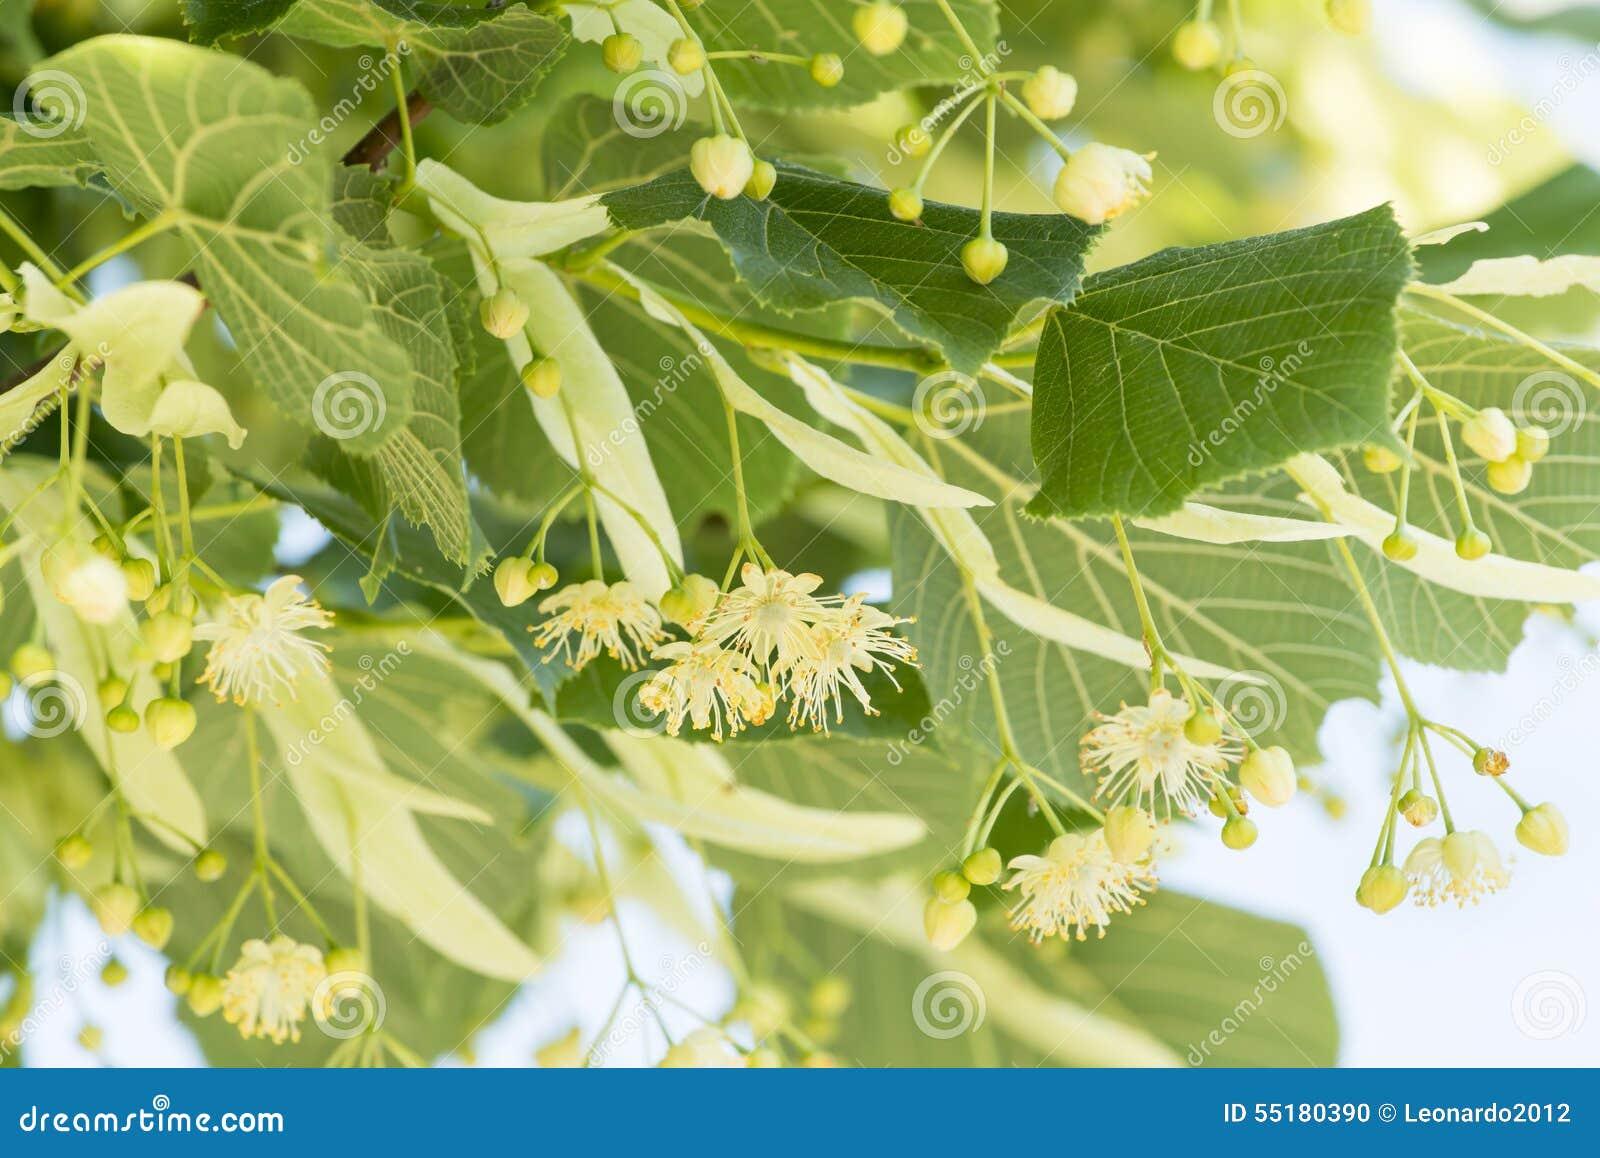 Linden Flower The Tree Alternative Natural Medicine Stock Image